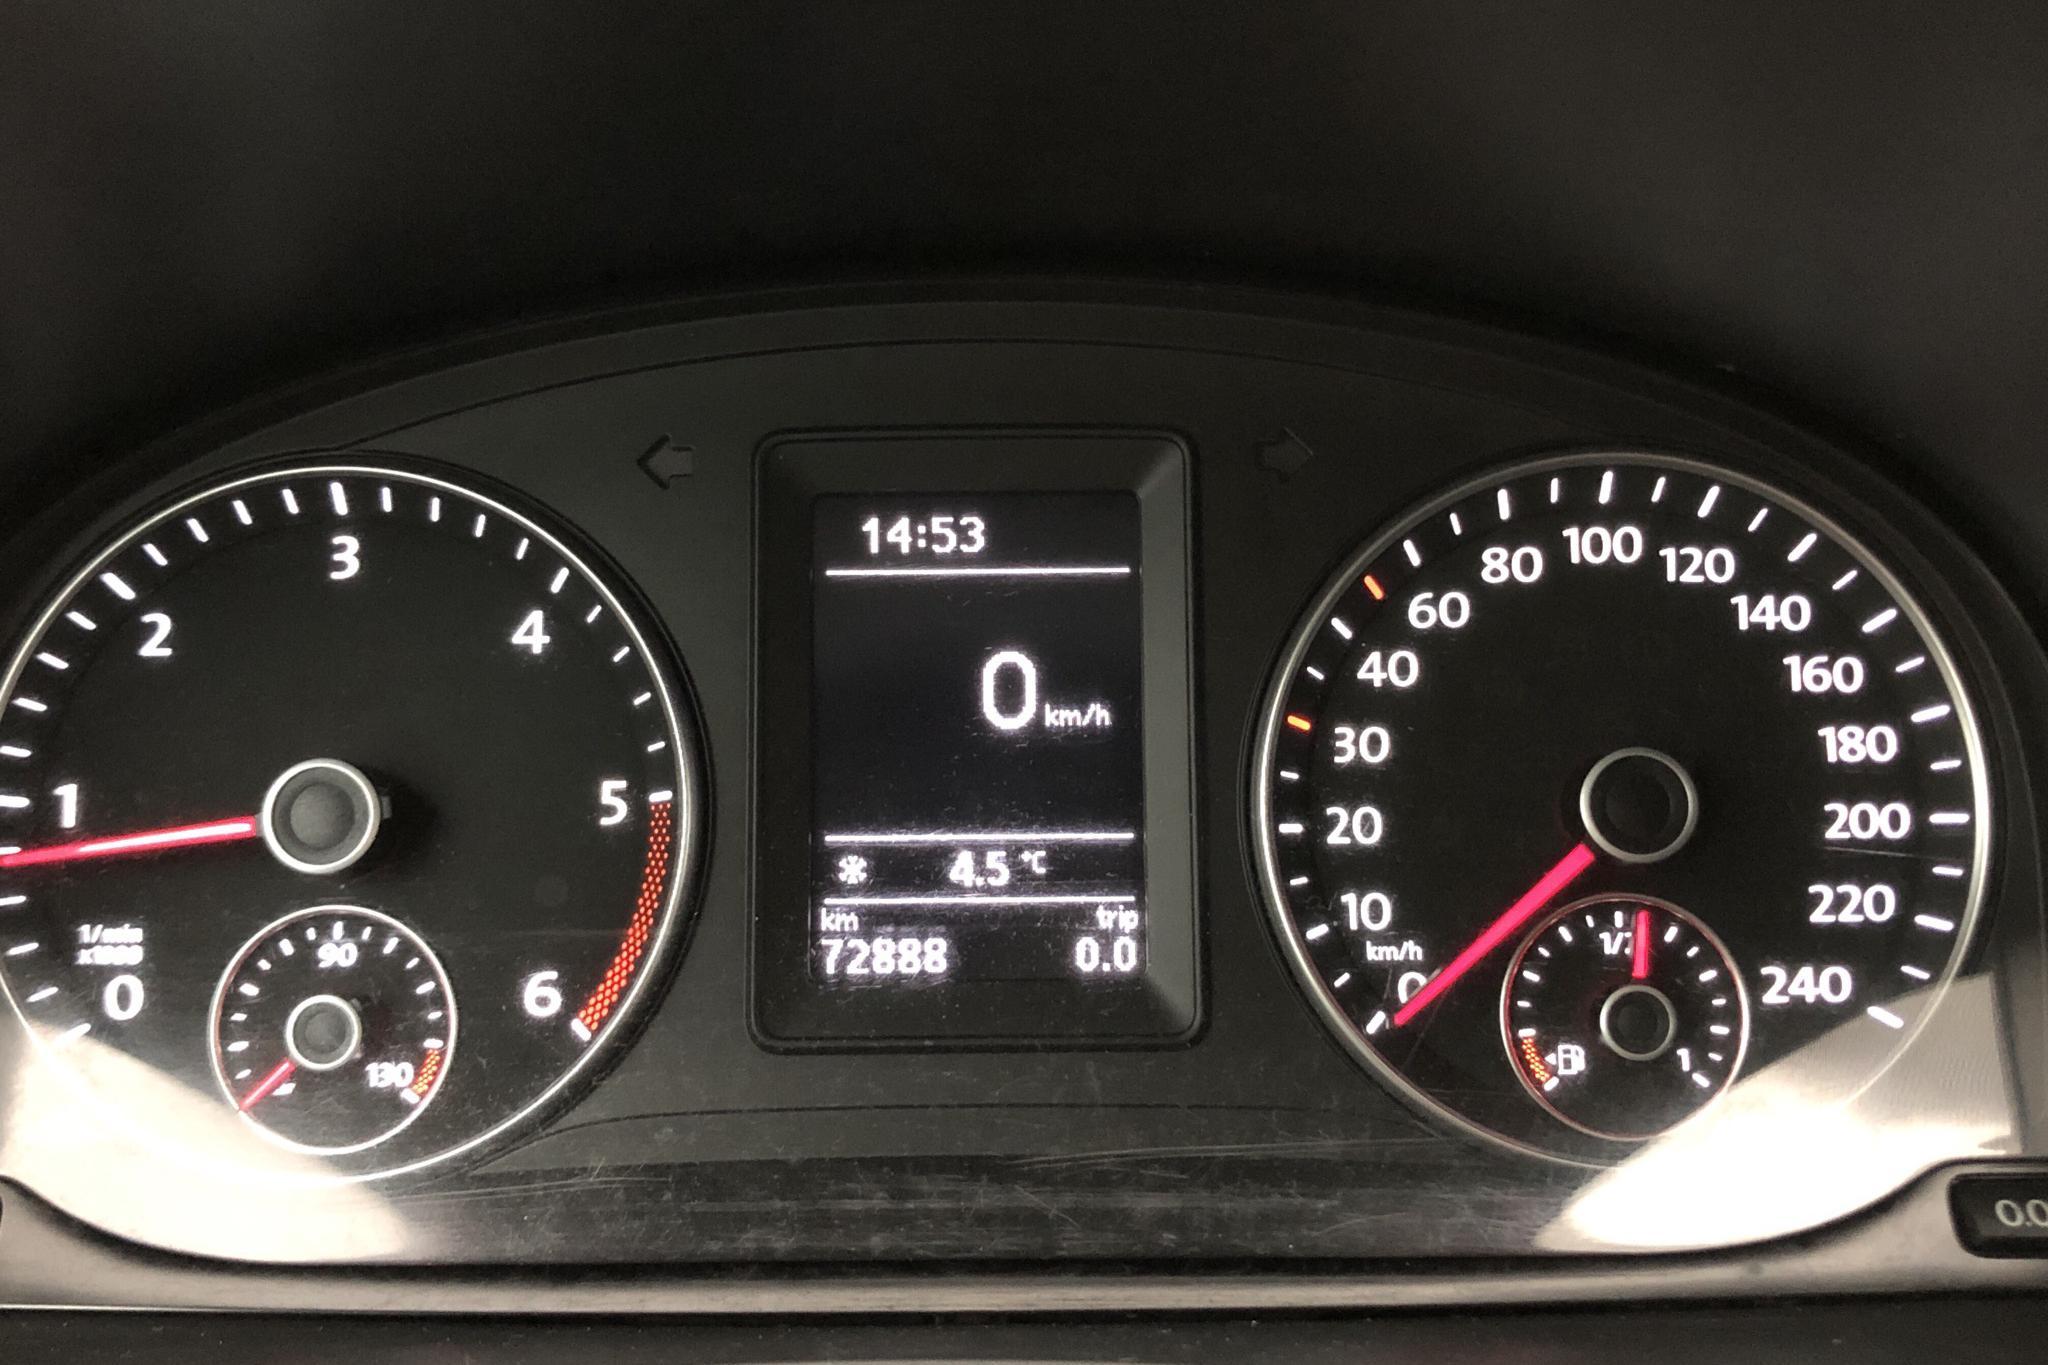 VW Caddy 1.6 TDI Maxi Skåp (102hk) - 72 880 km - Manual - yellow - 2016